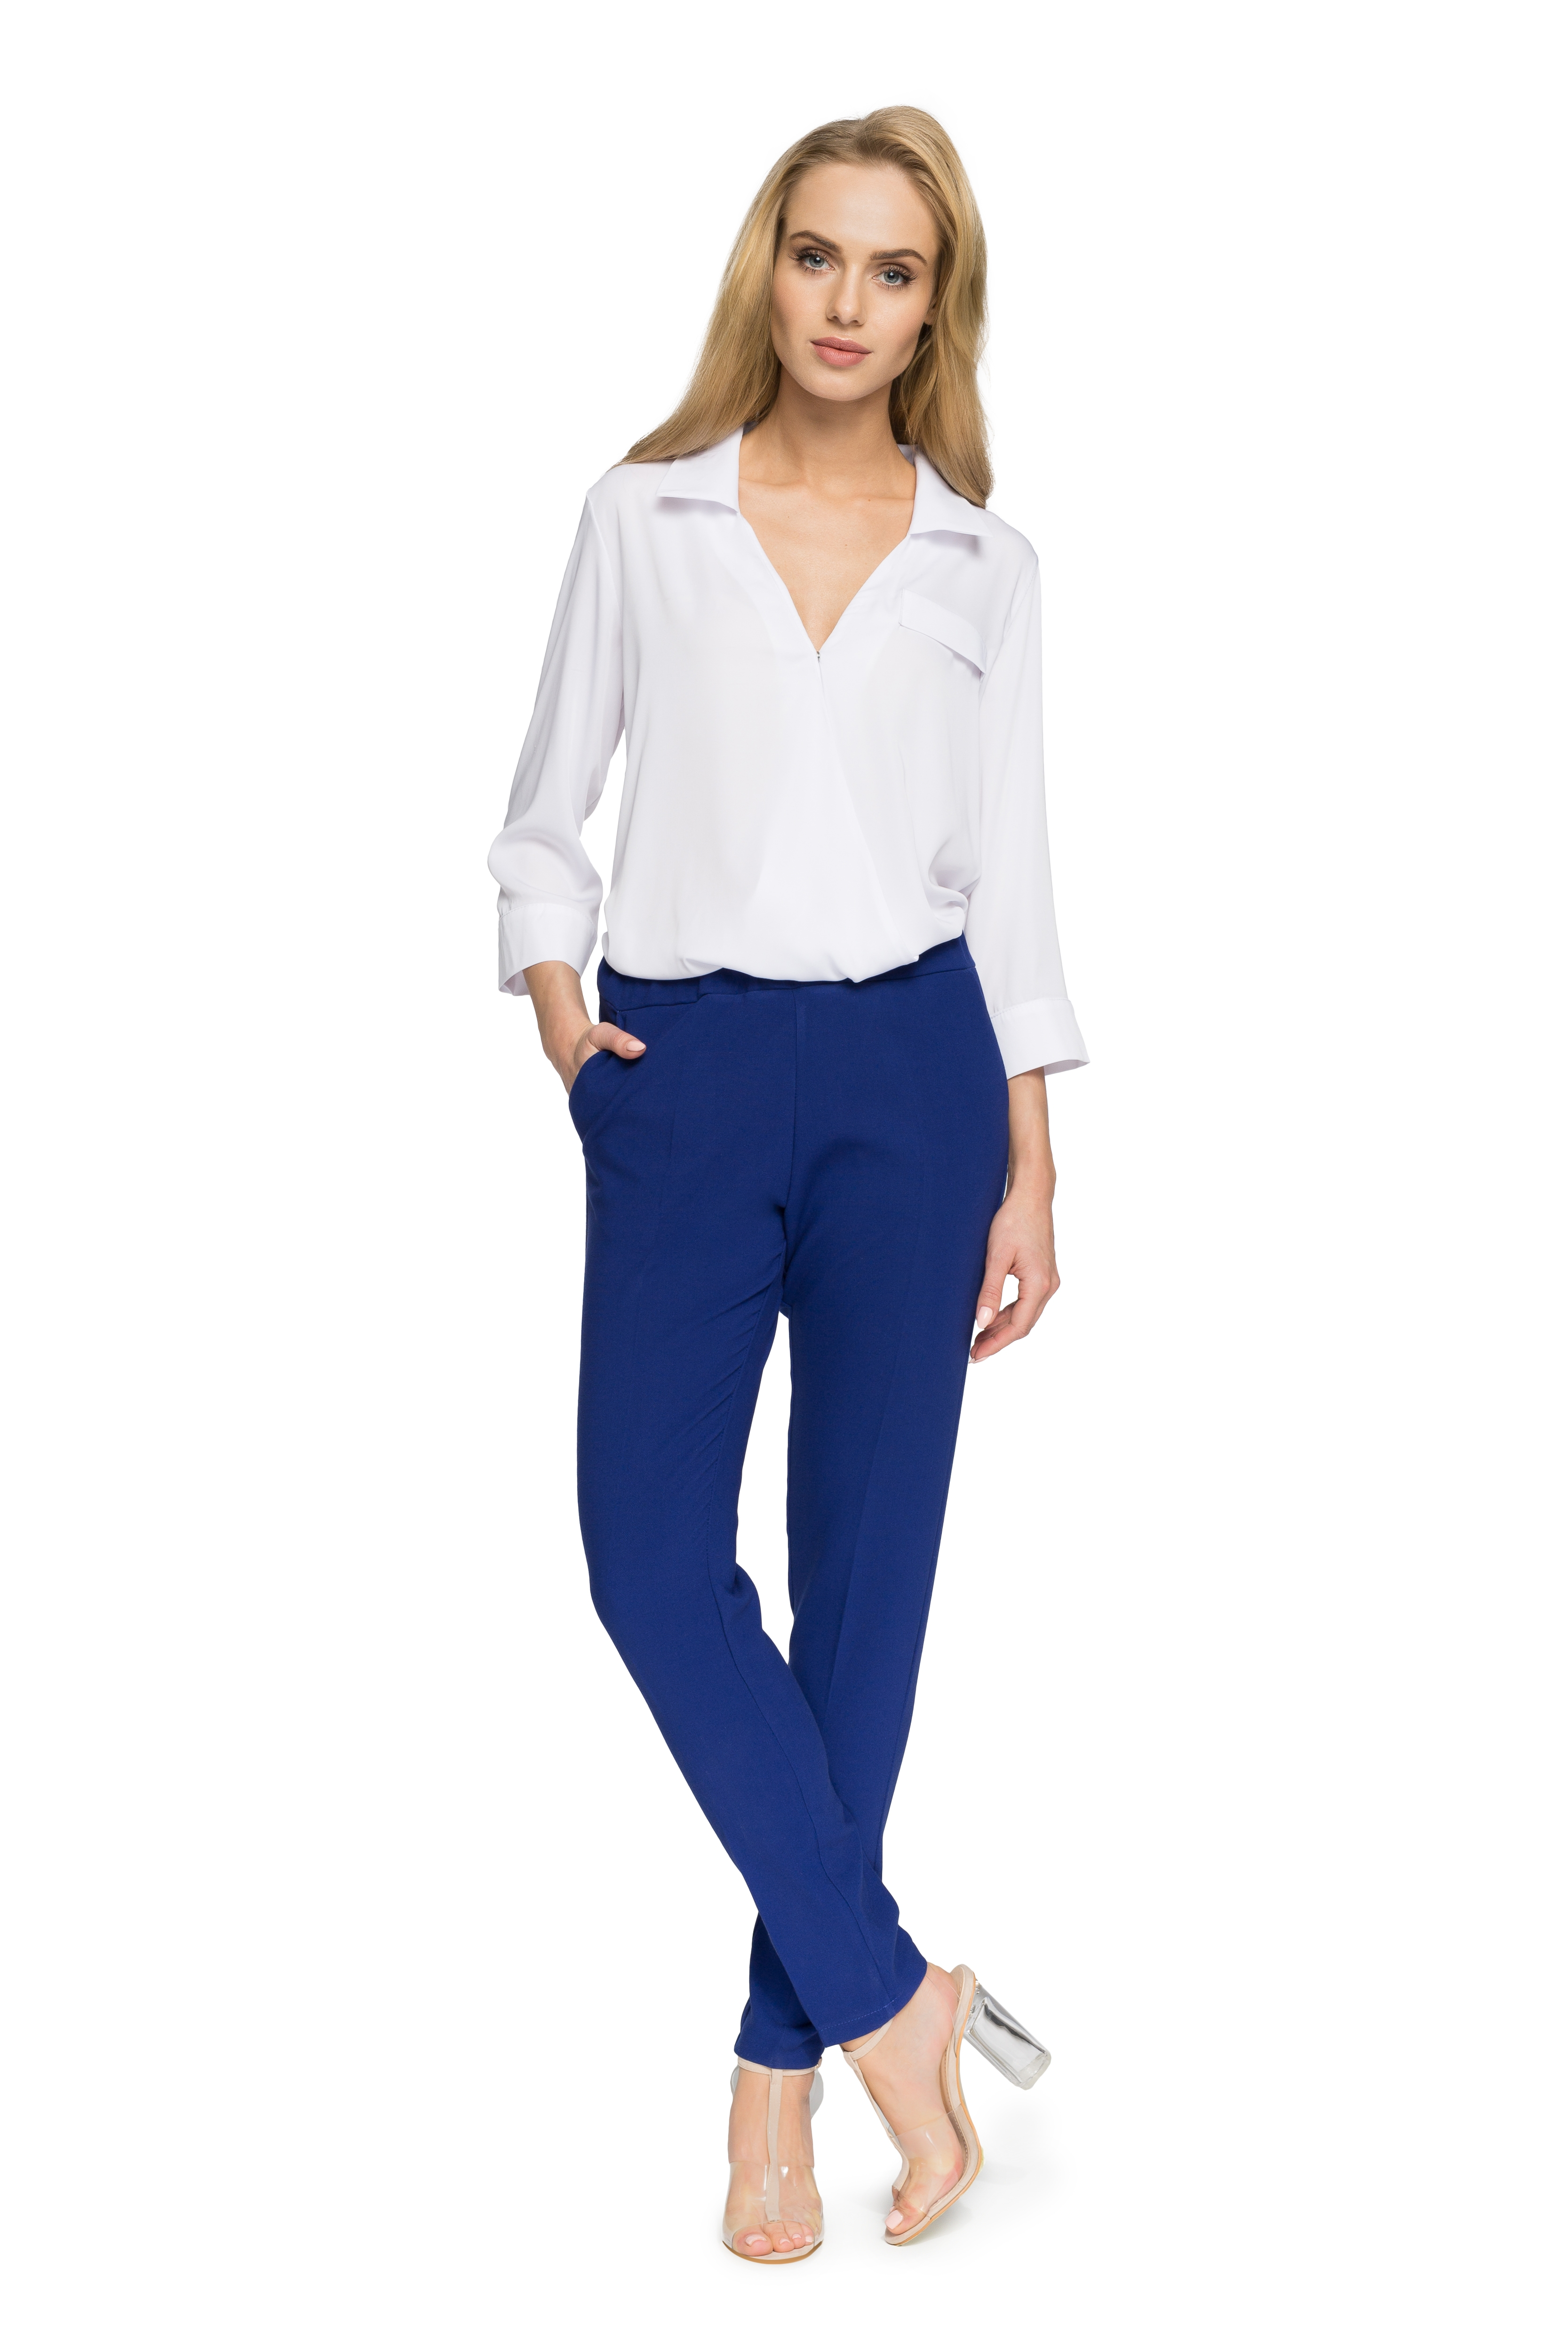 6ed76806486b Kráľovské modré nohavice Style 054 - Glami.sk